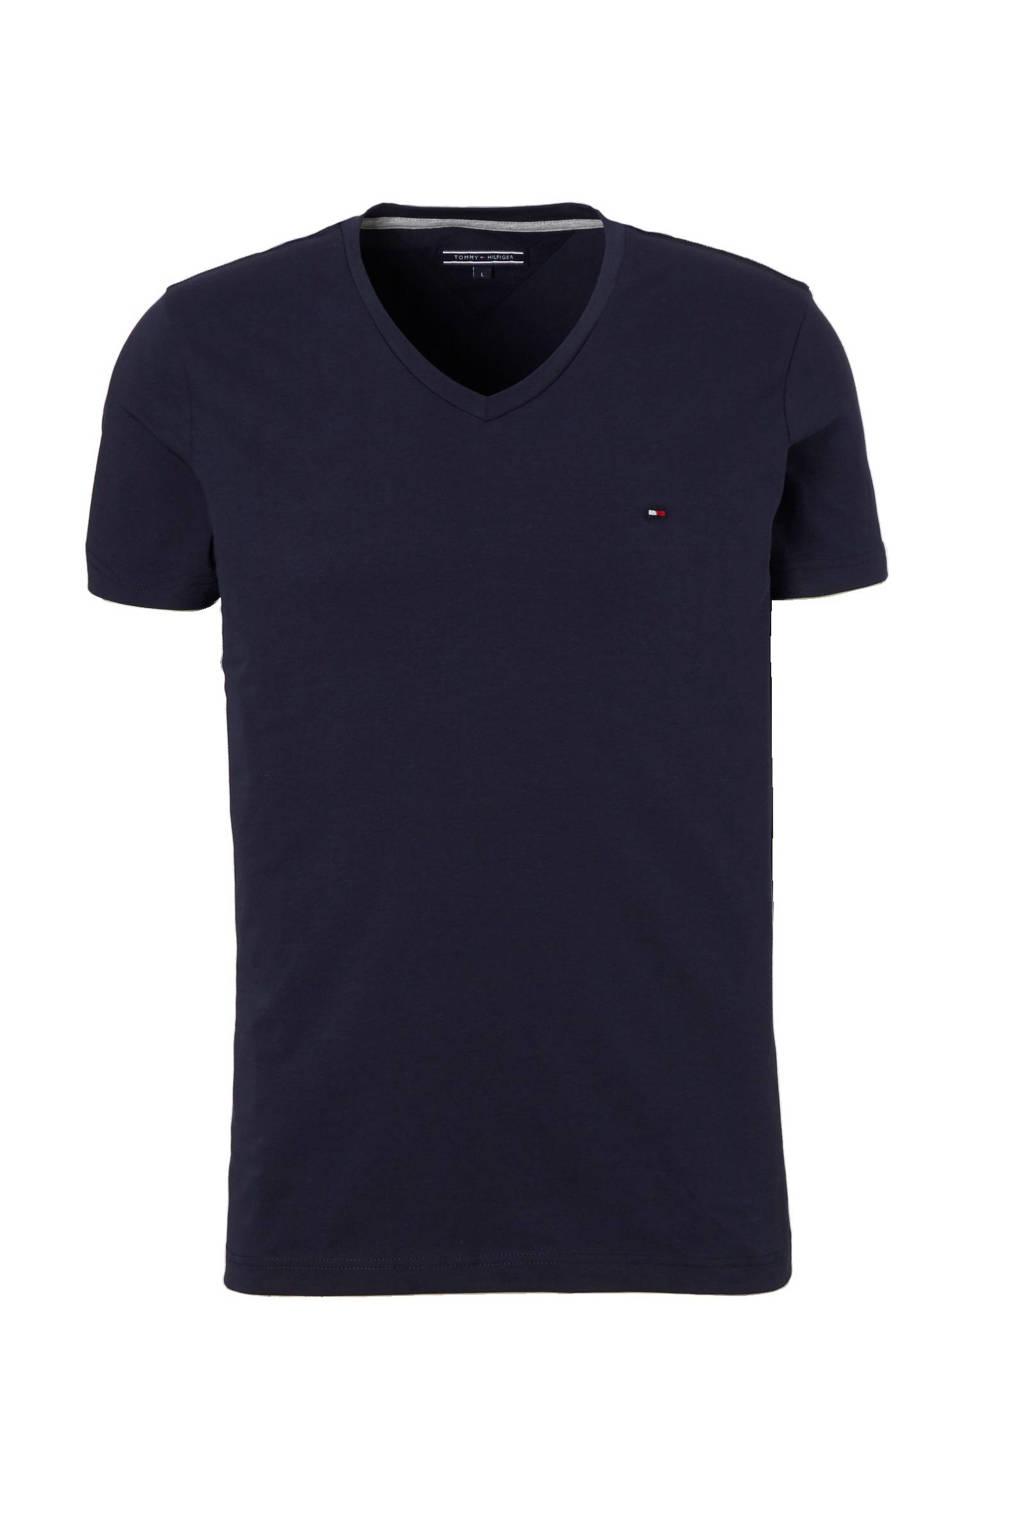 Tommy Hilfiger T-shirt, Marine